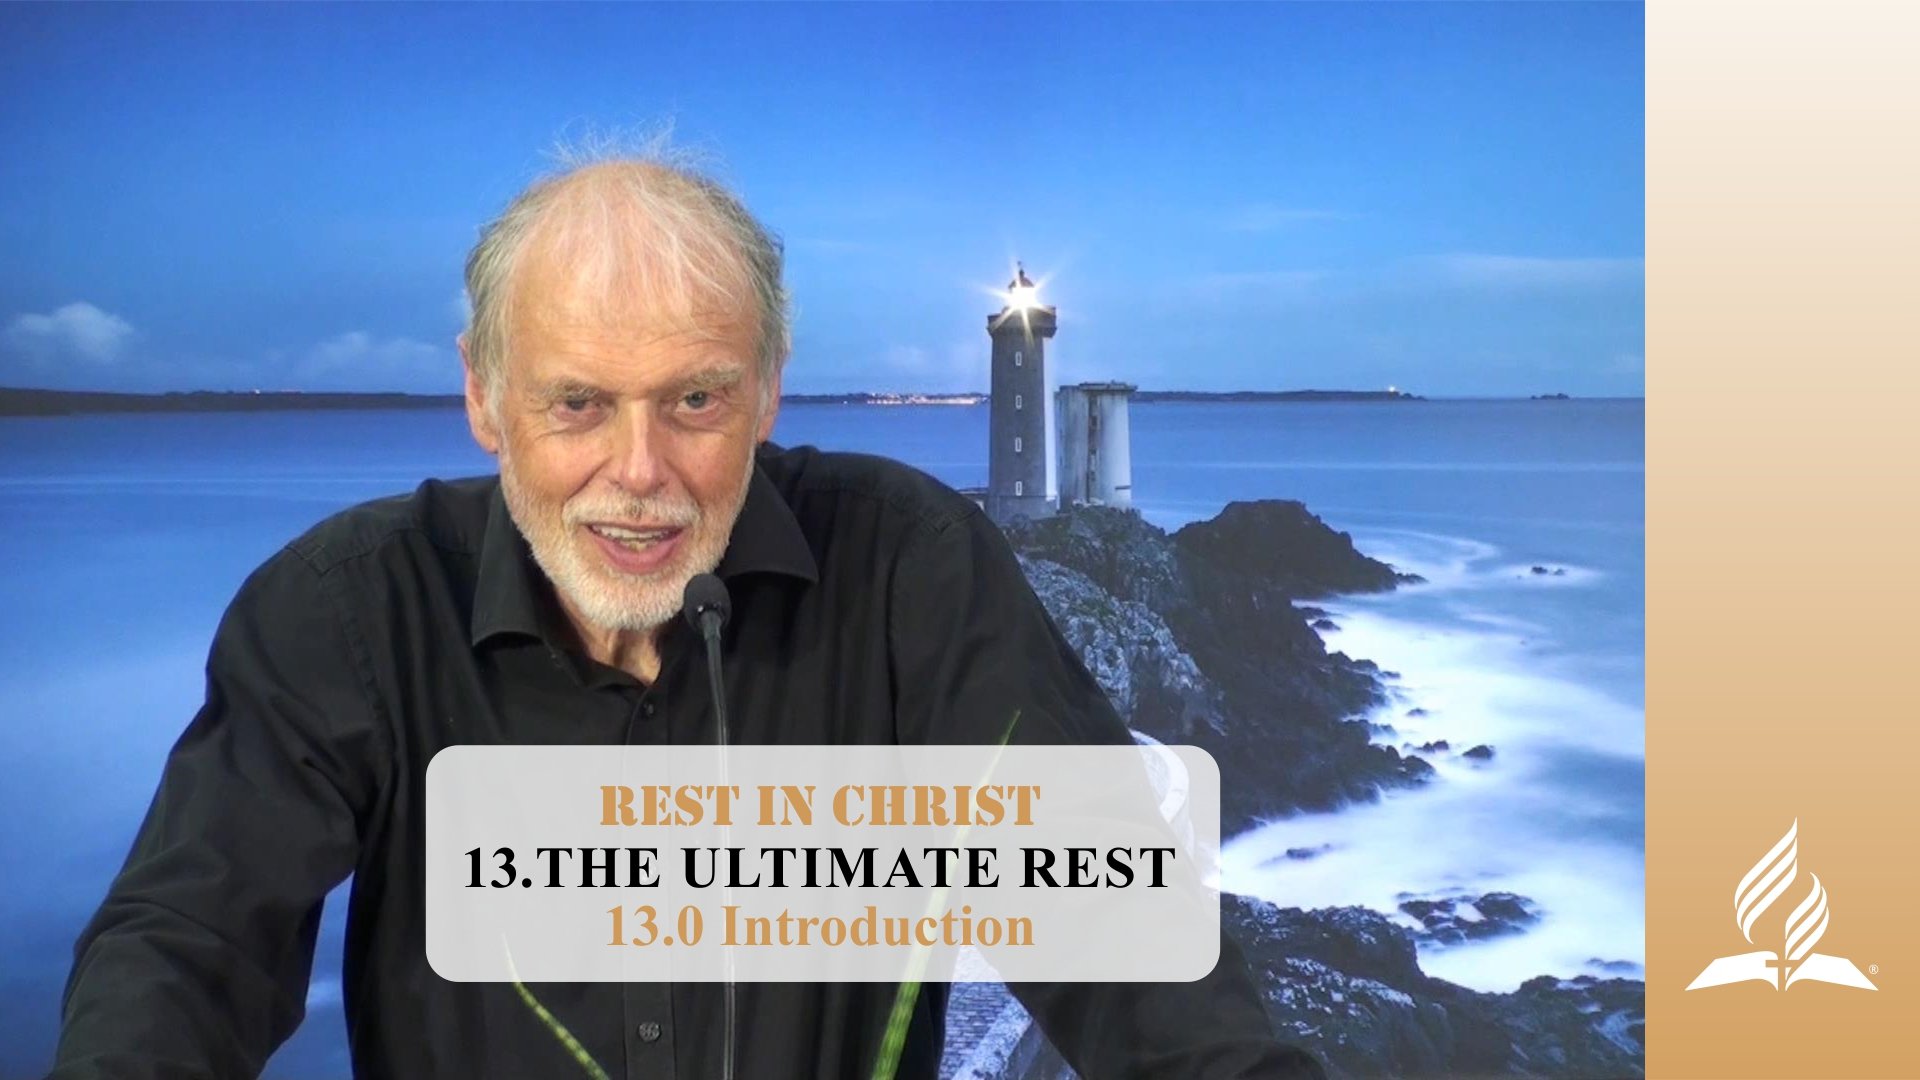 13.0 Introduction – THE ULTIMATE REST   Pastor Kurt Piesslinger, M.A.